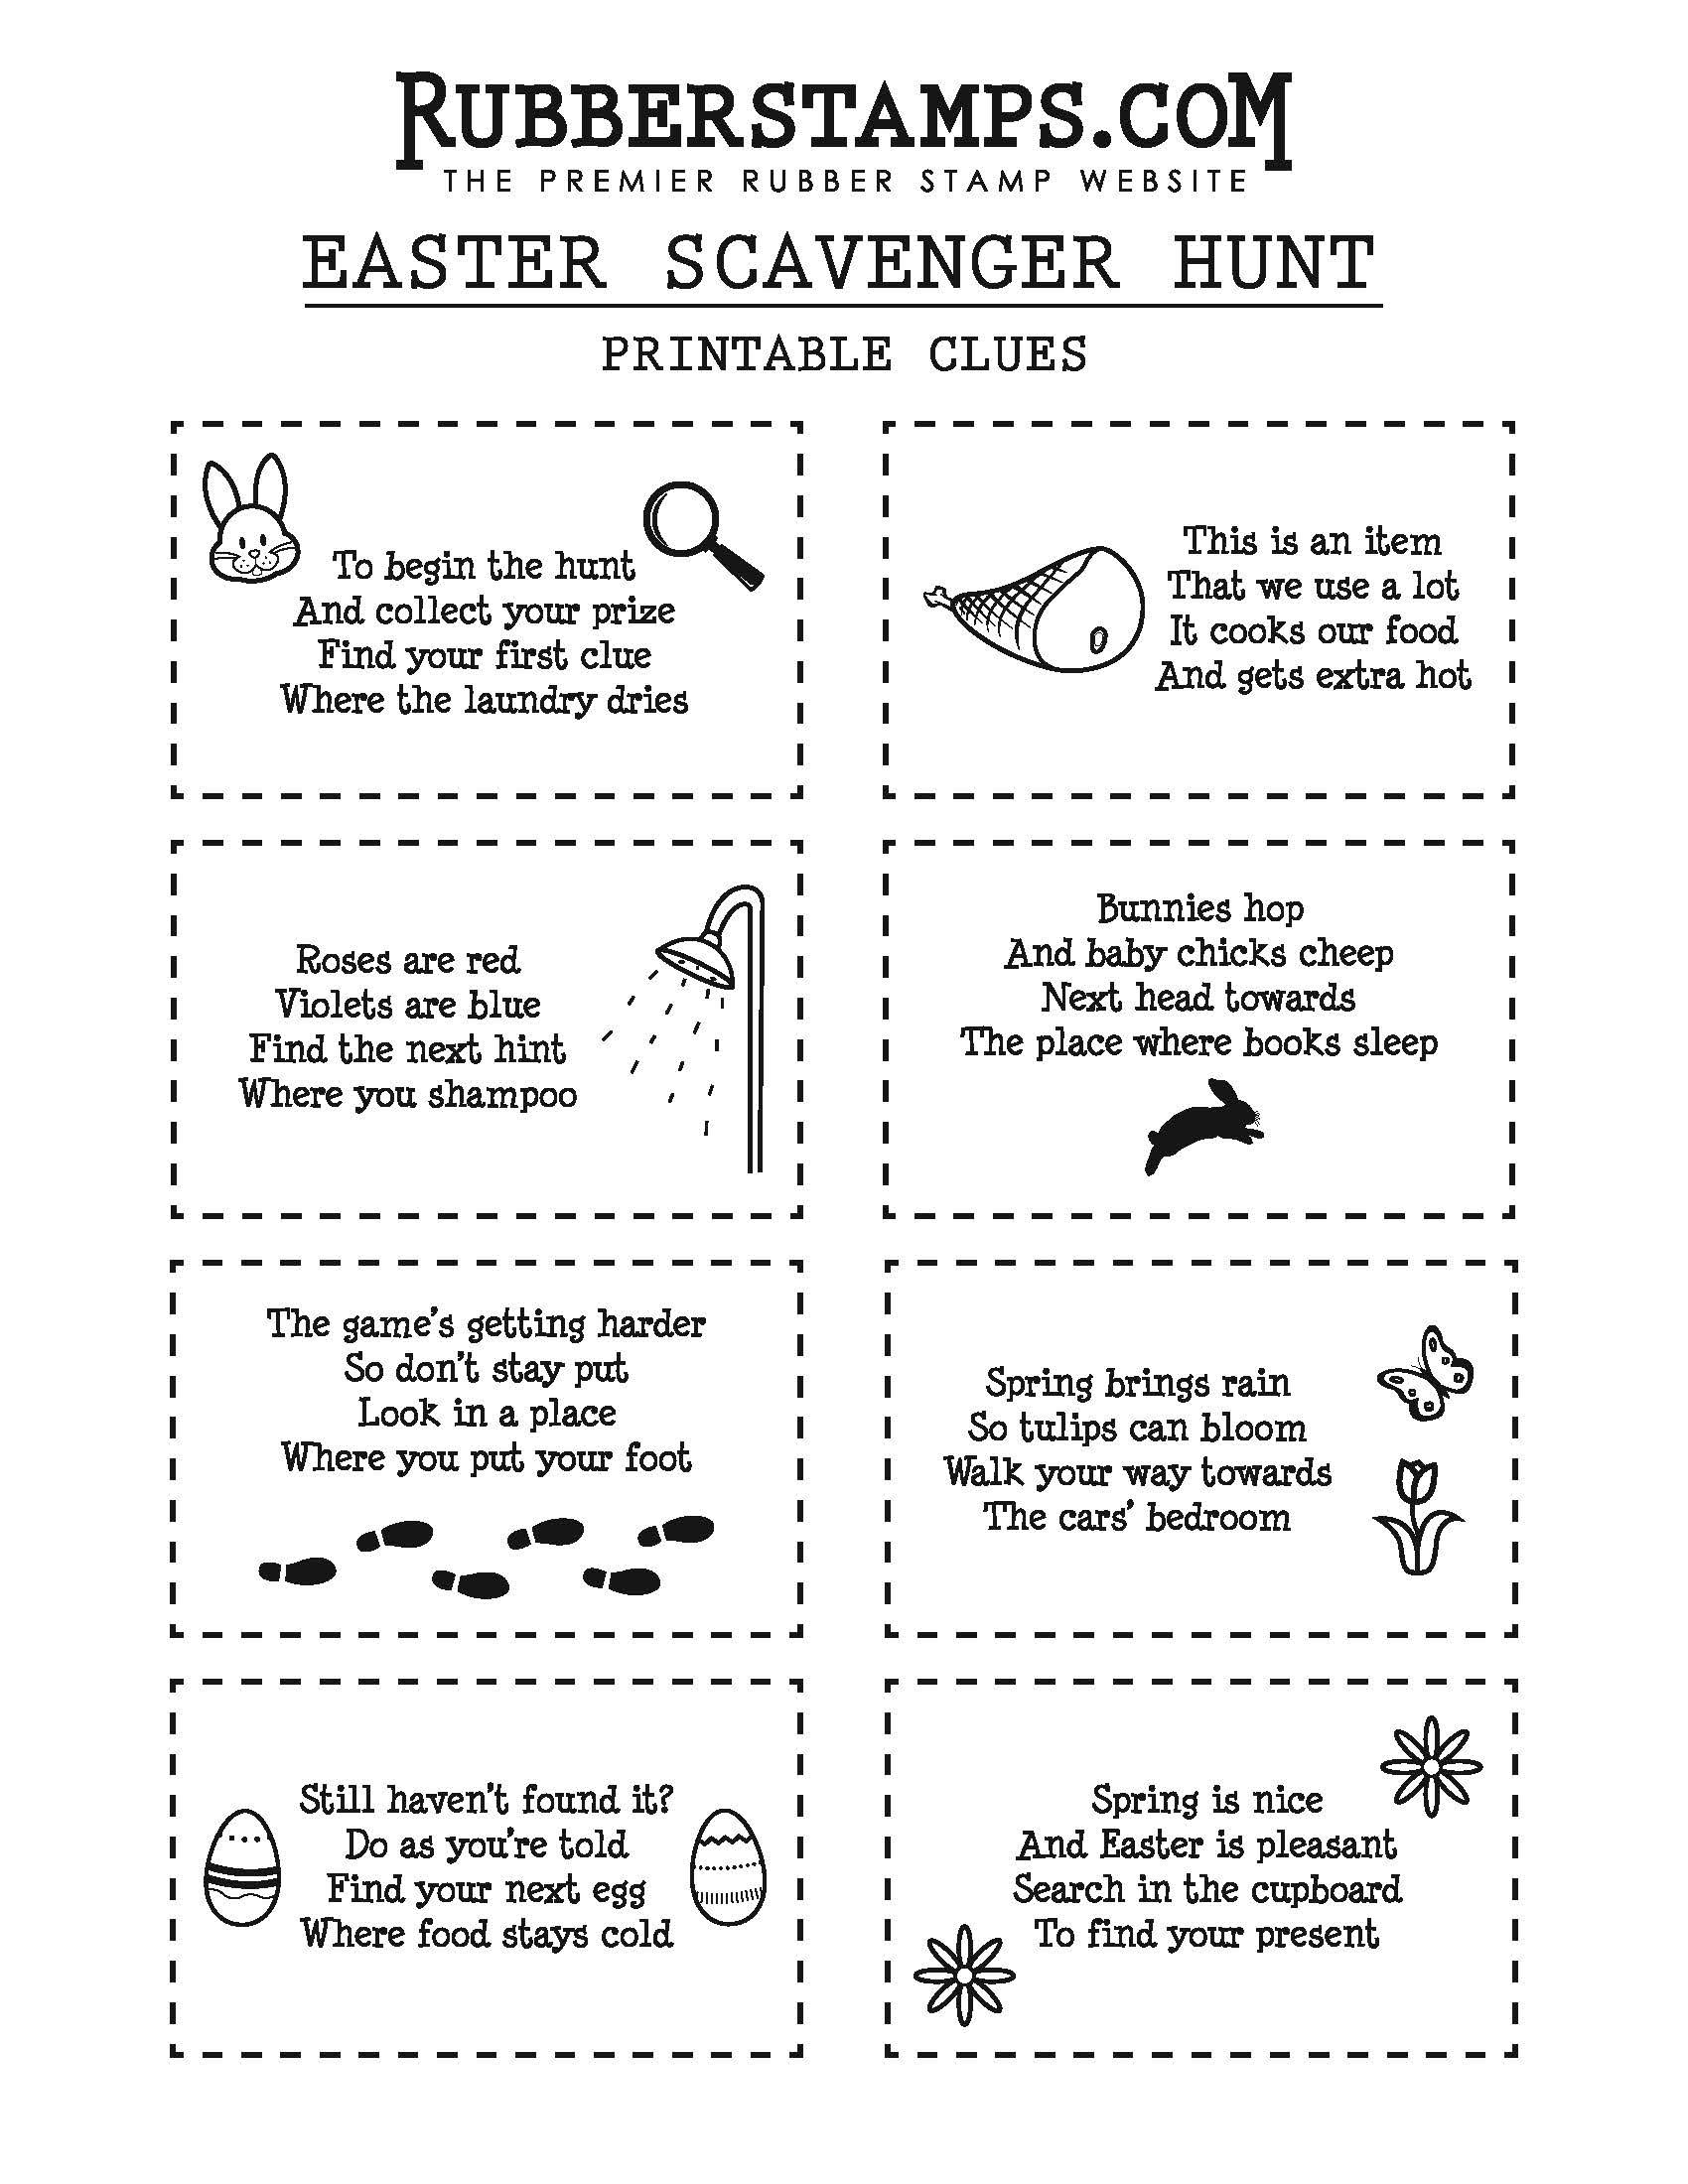 Diy Easter Scavenger Hunt Clues Free Printable